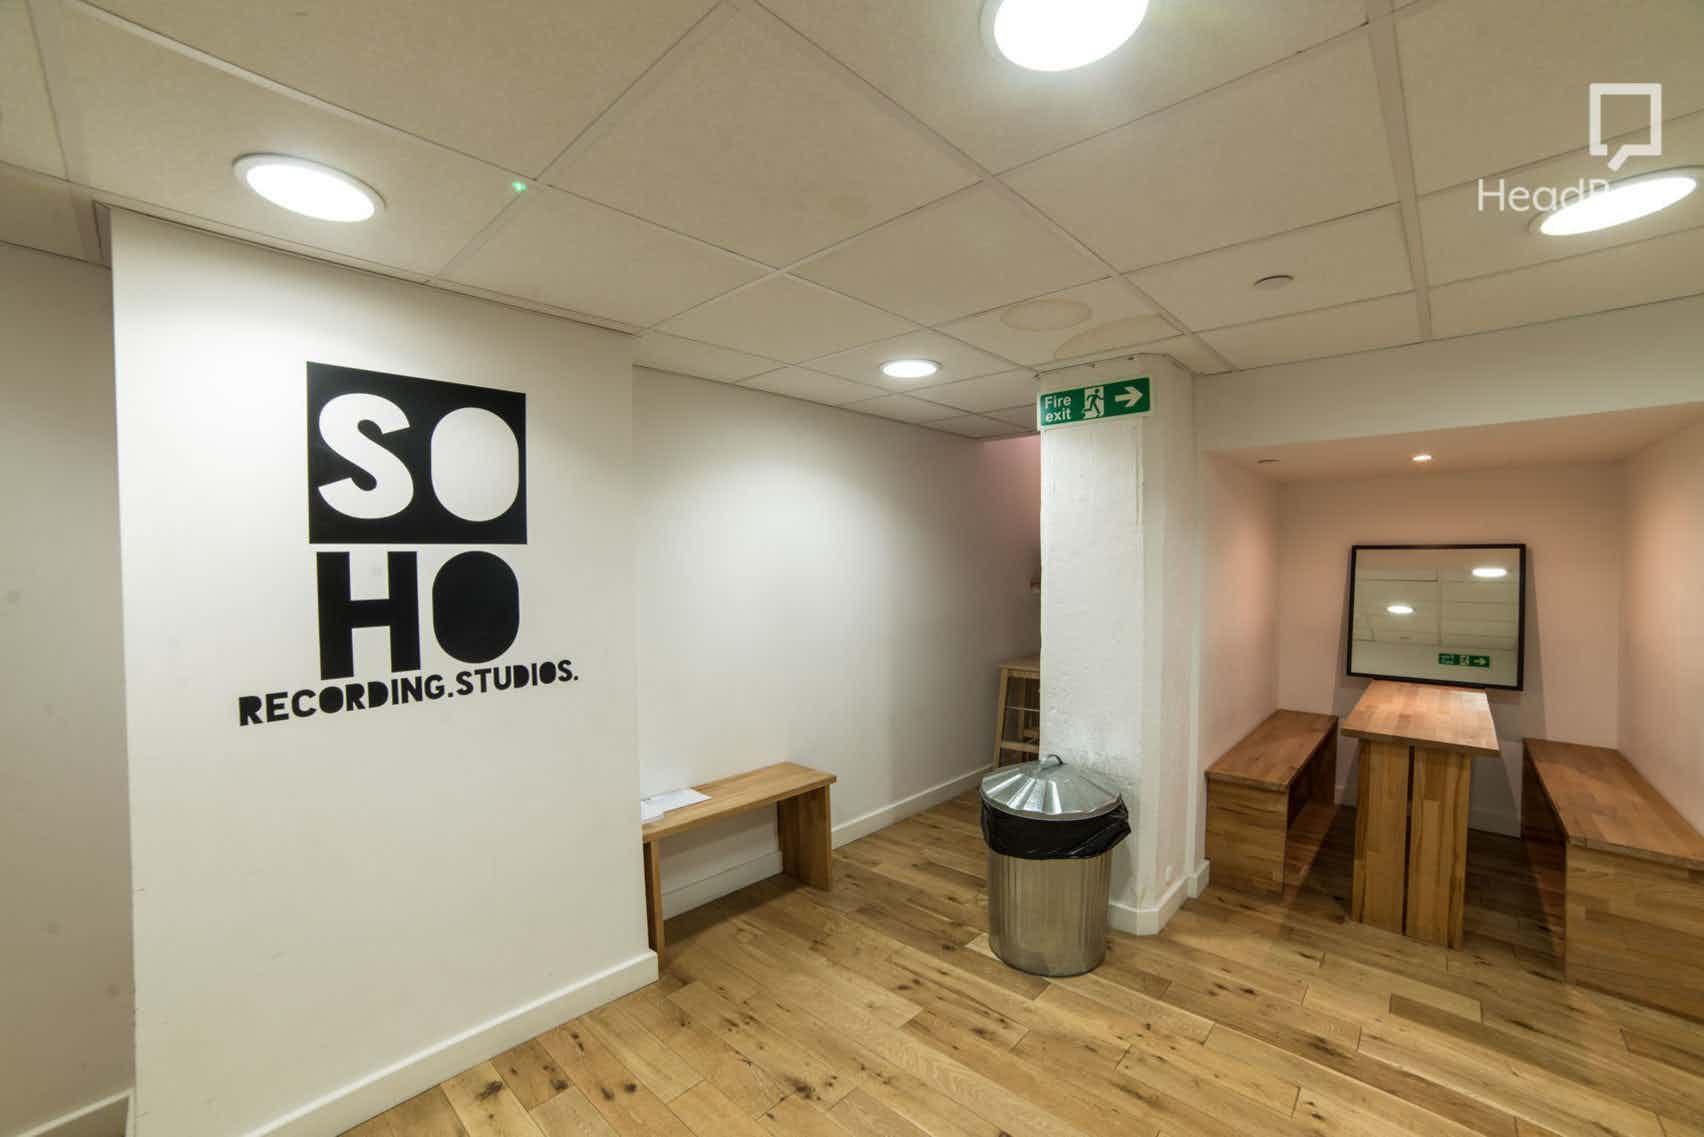 Vocal Booth, Soho Recording Studios